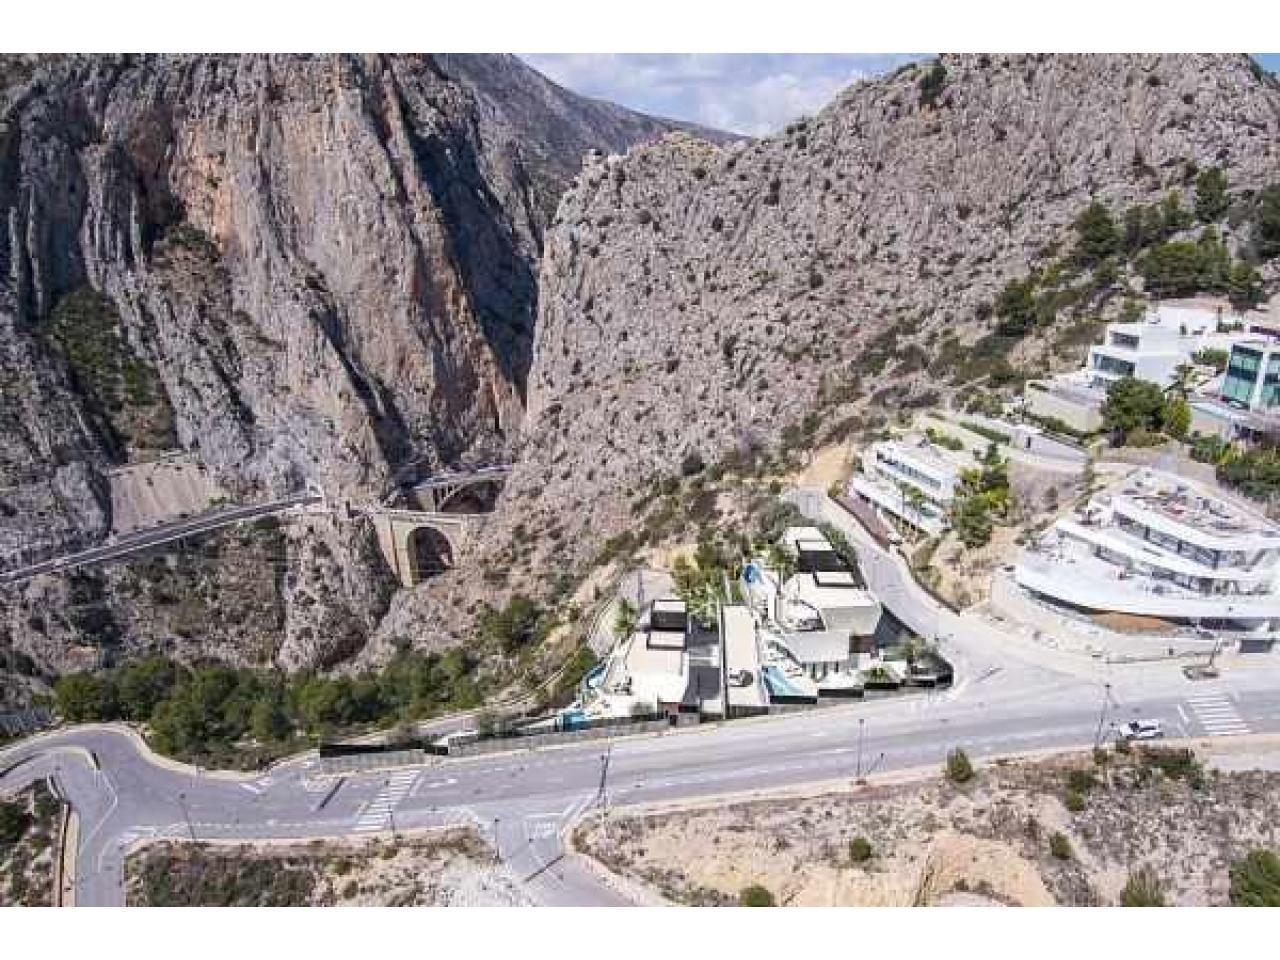 Недвижимость в Испании, Новая вилла с видами на море от застройщика в Альтеа,Коста Бланка,Испания - 6